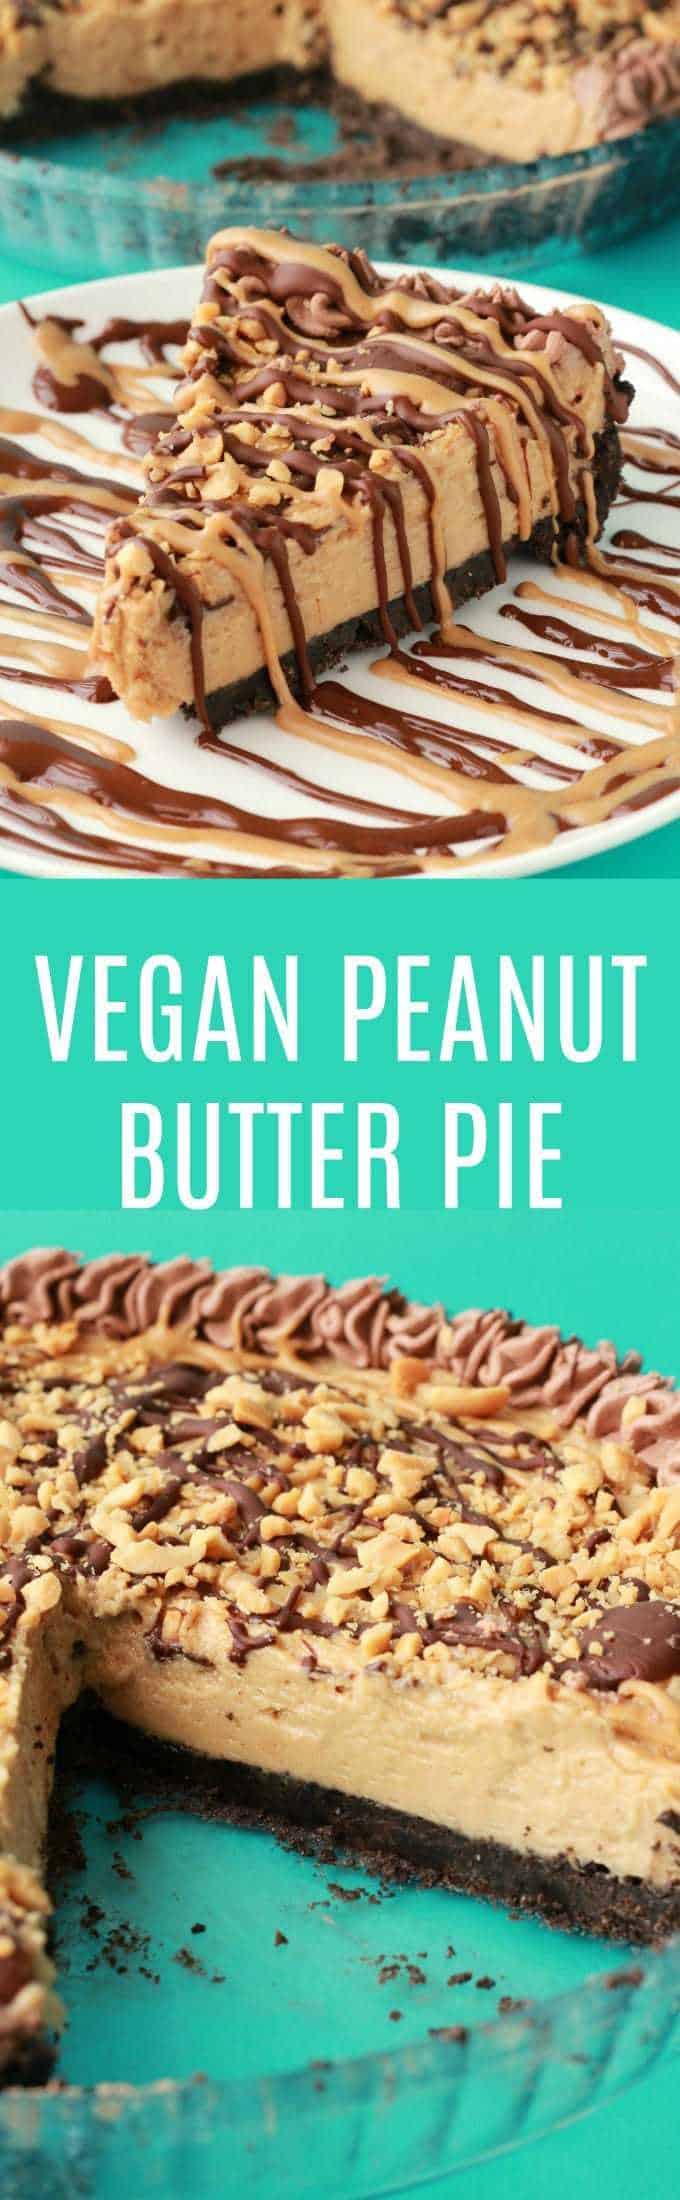 Vegan Peanut Butter Pie. Purely irresistible no-bake vegan pie with an oreo cookie crust, creamy peanut butter filling and drizzled peanut butter and chocolate topping! Vegan | Vegan Dessert | Vegan Pie | Vegan Recipes | Dairy Free | lovingitvegan.com